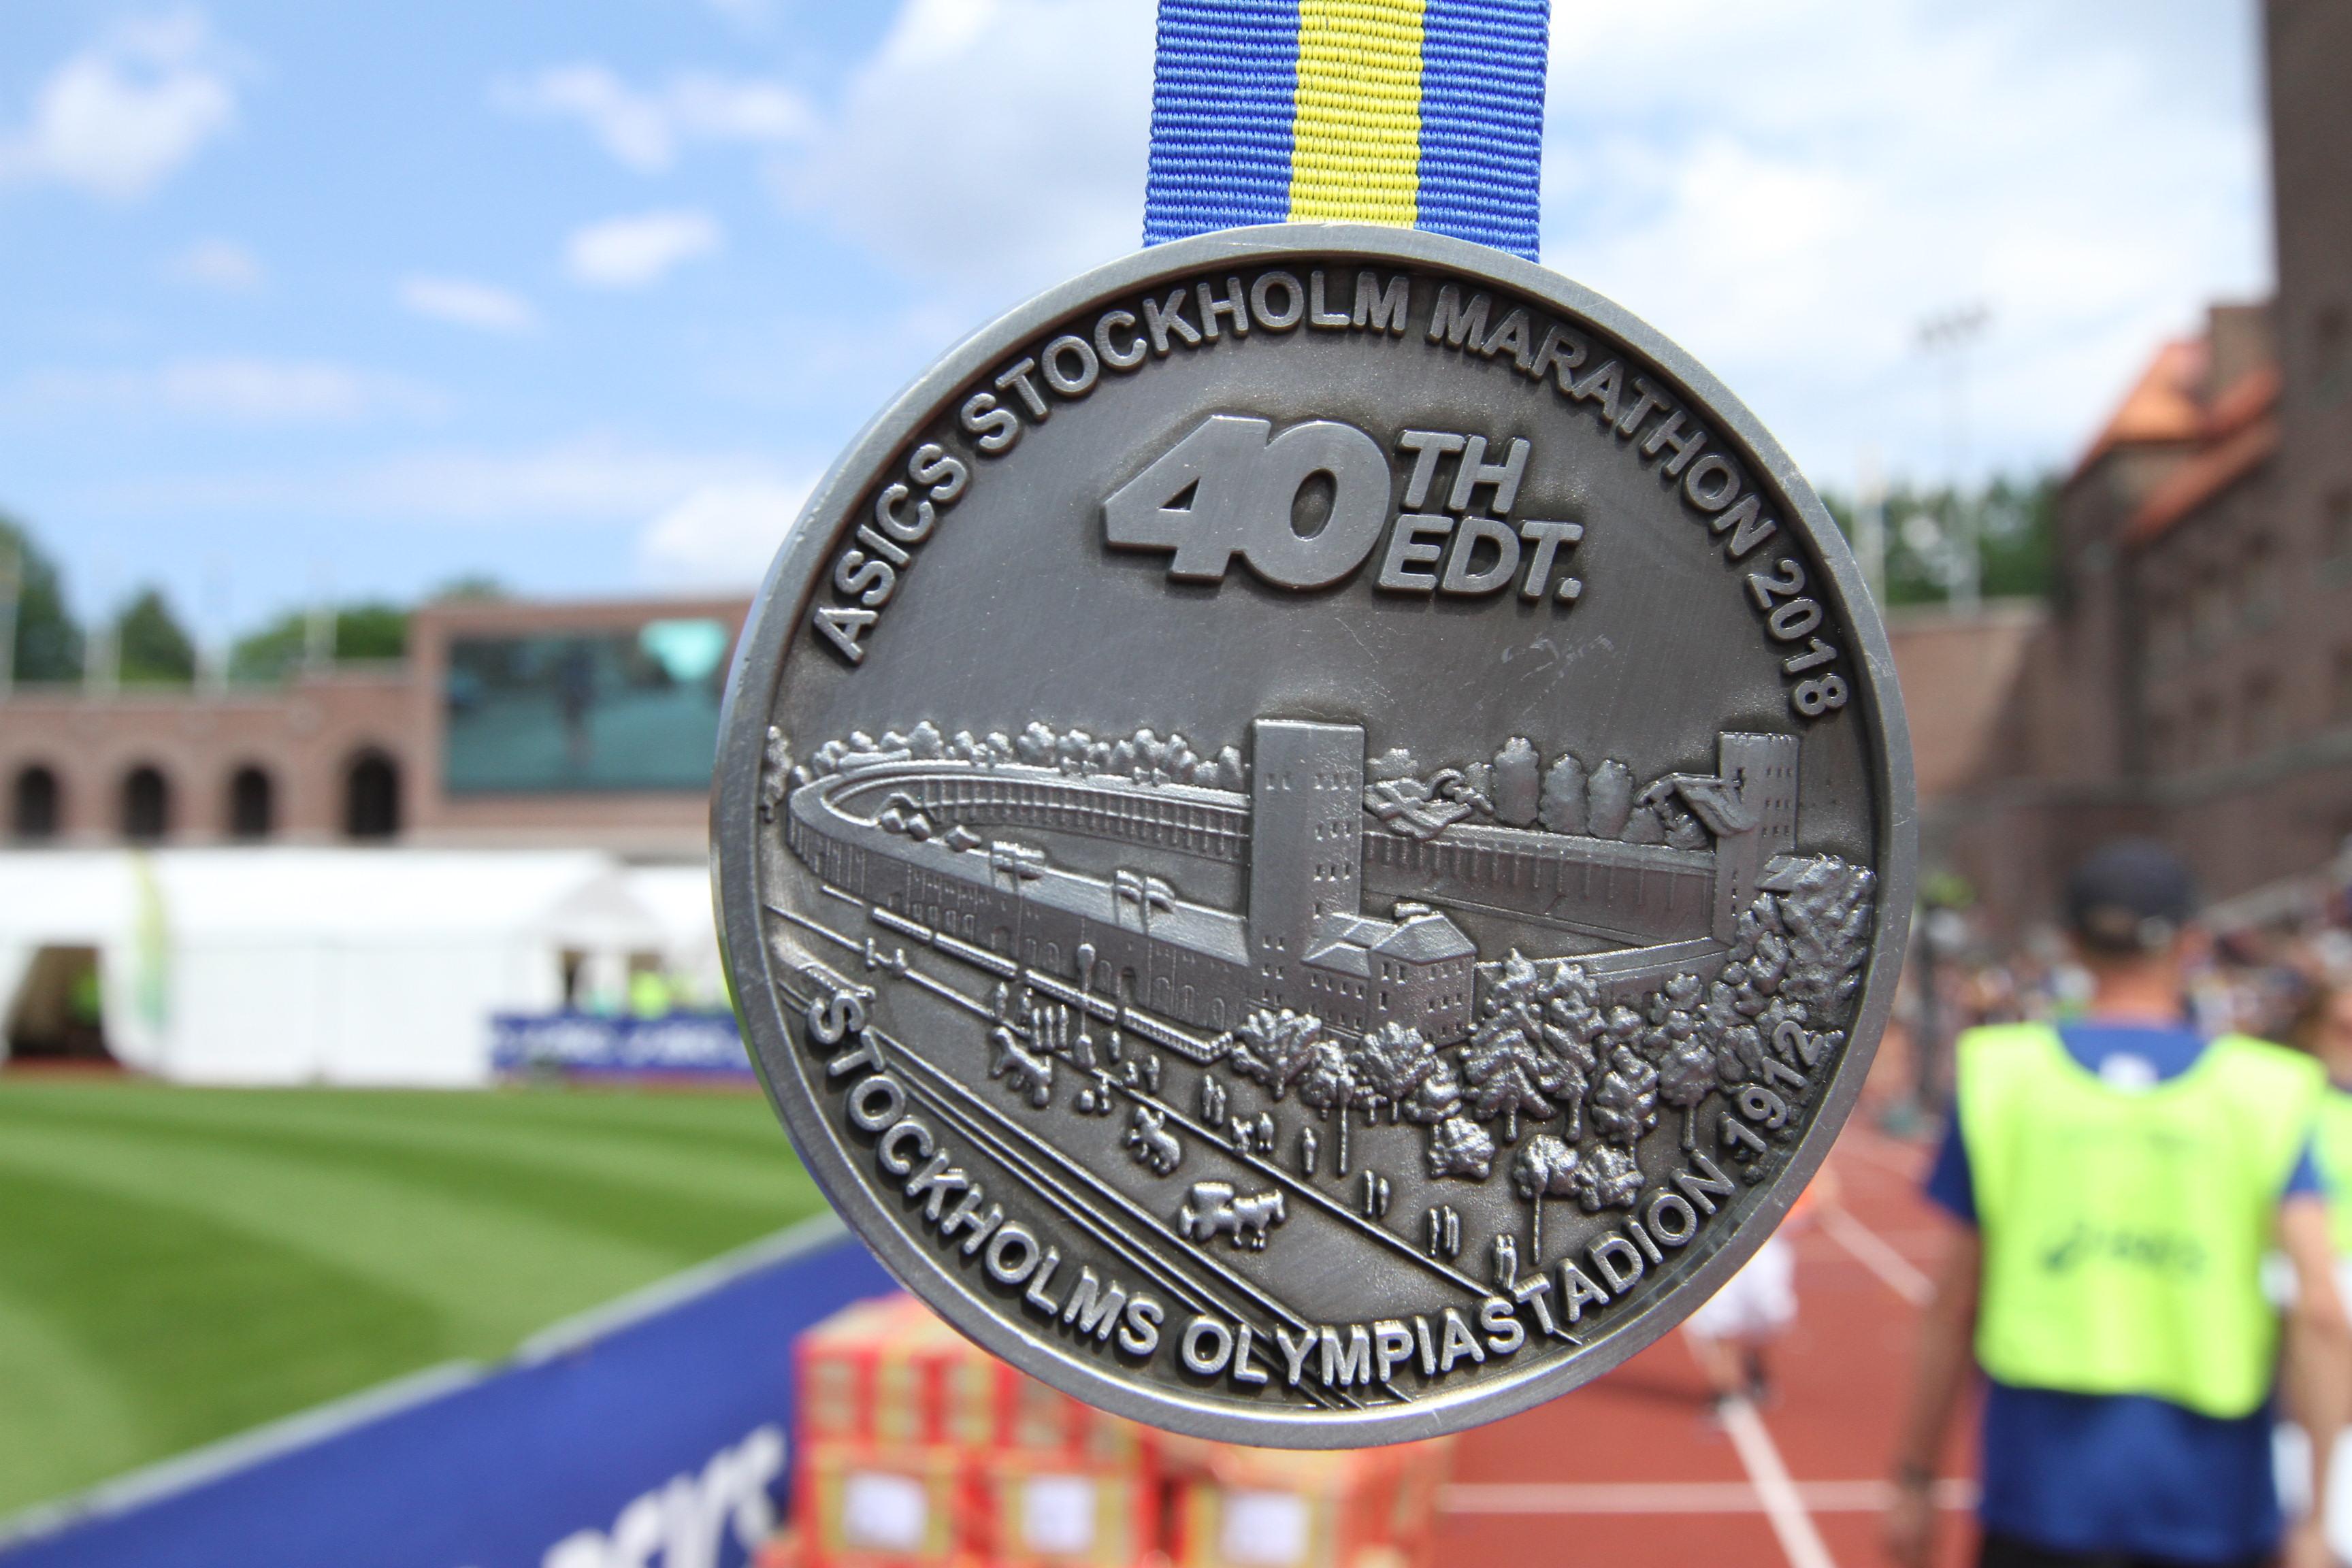 stockholm marathon 2018 medaljen